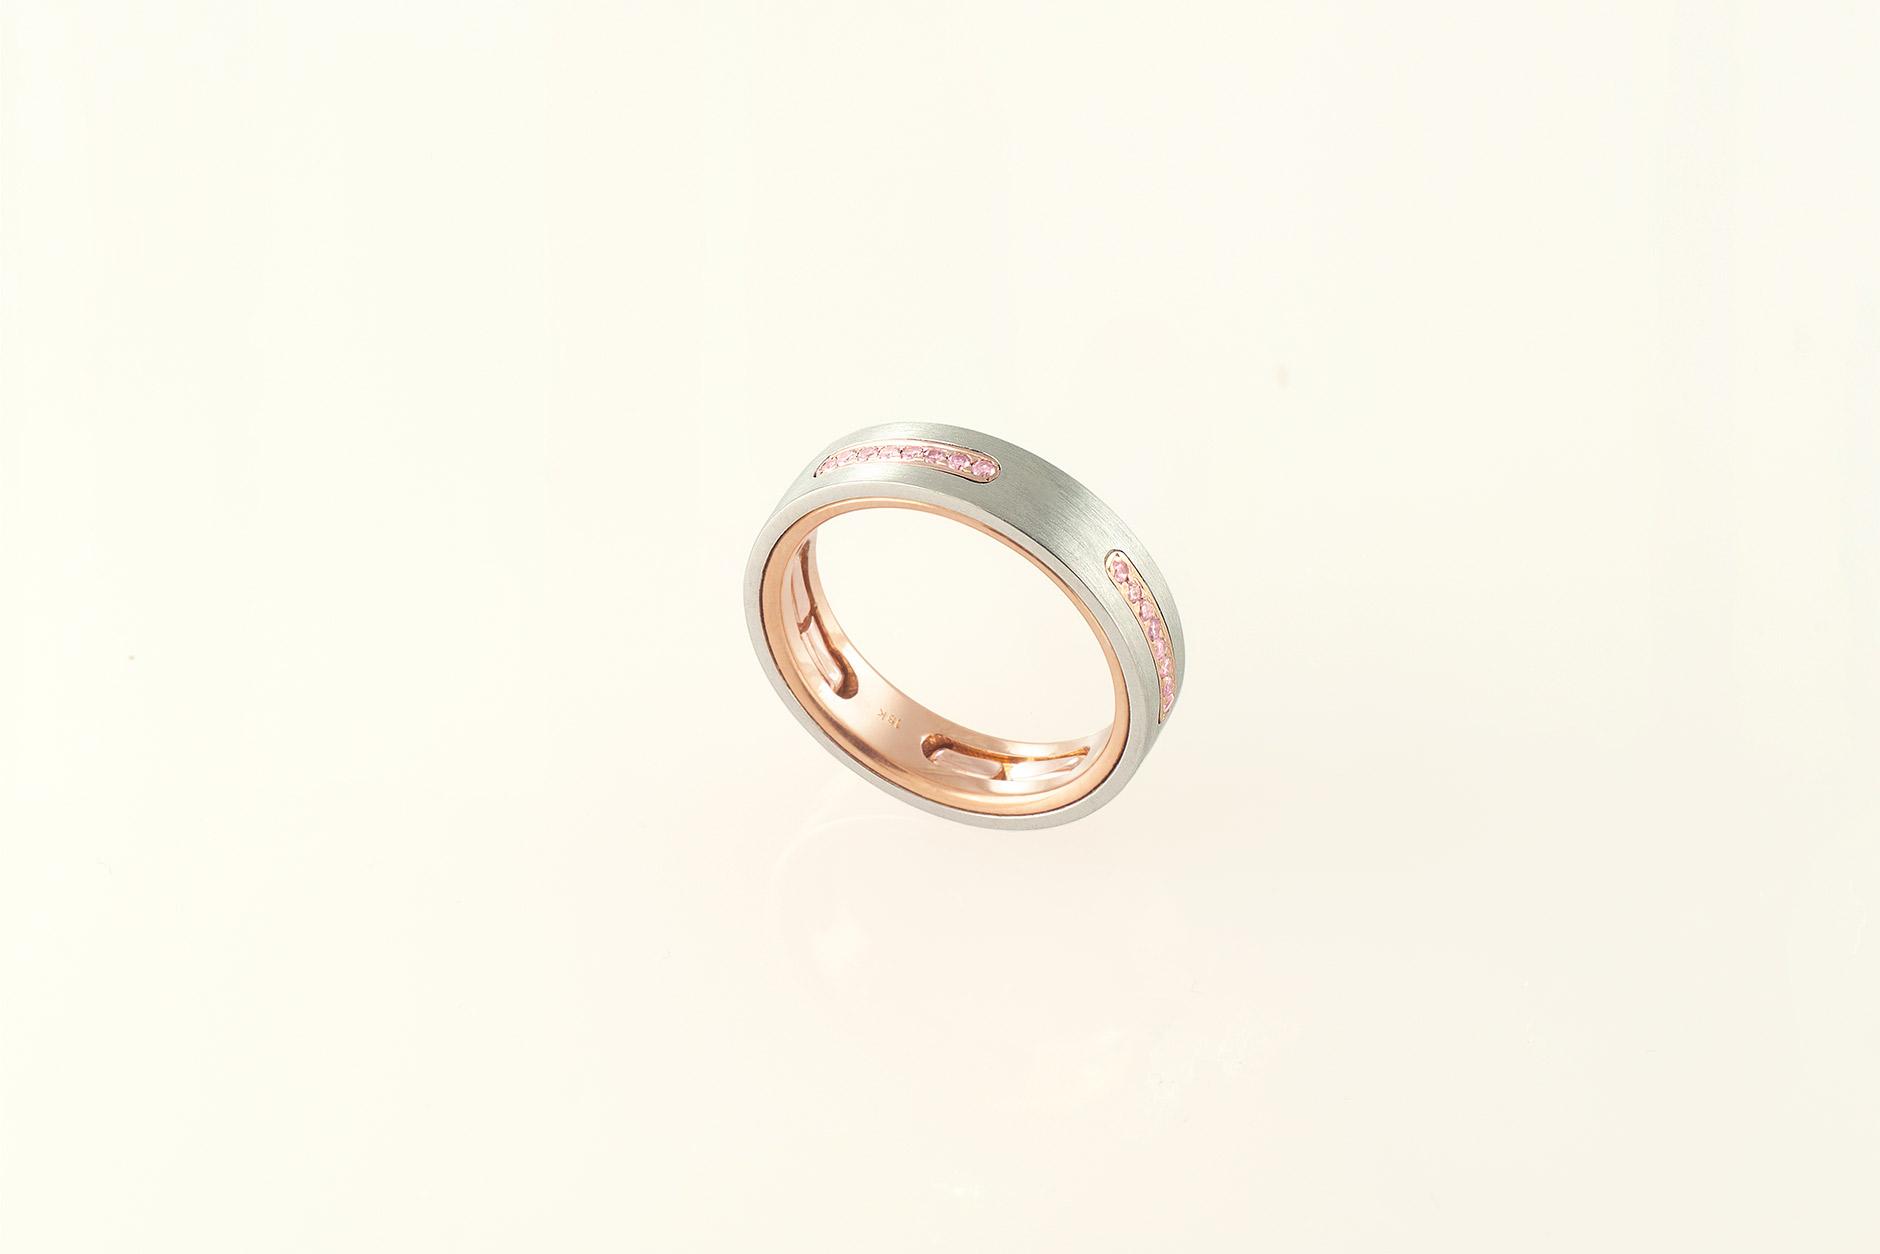 Staple Platinum & 18k Custom Natural Pink Diamond Wedding Band - NEWA Goldsmith